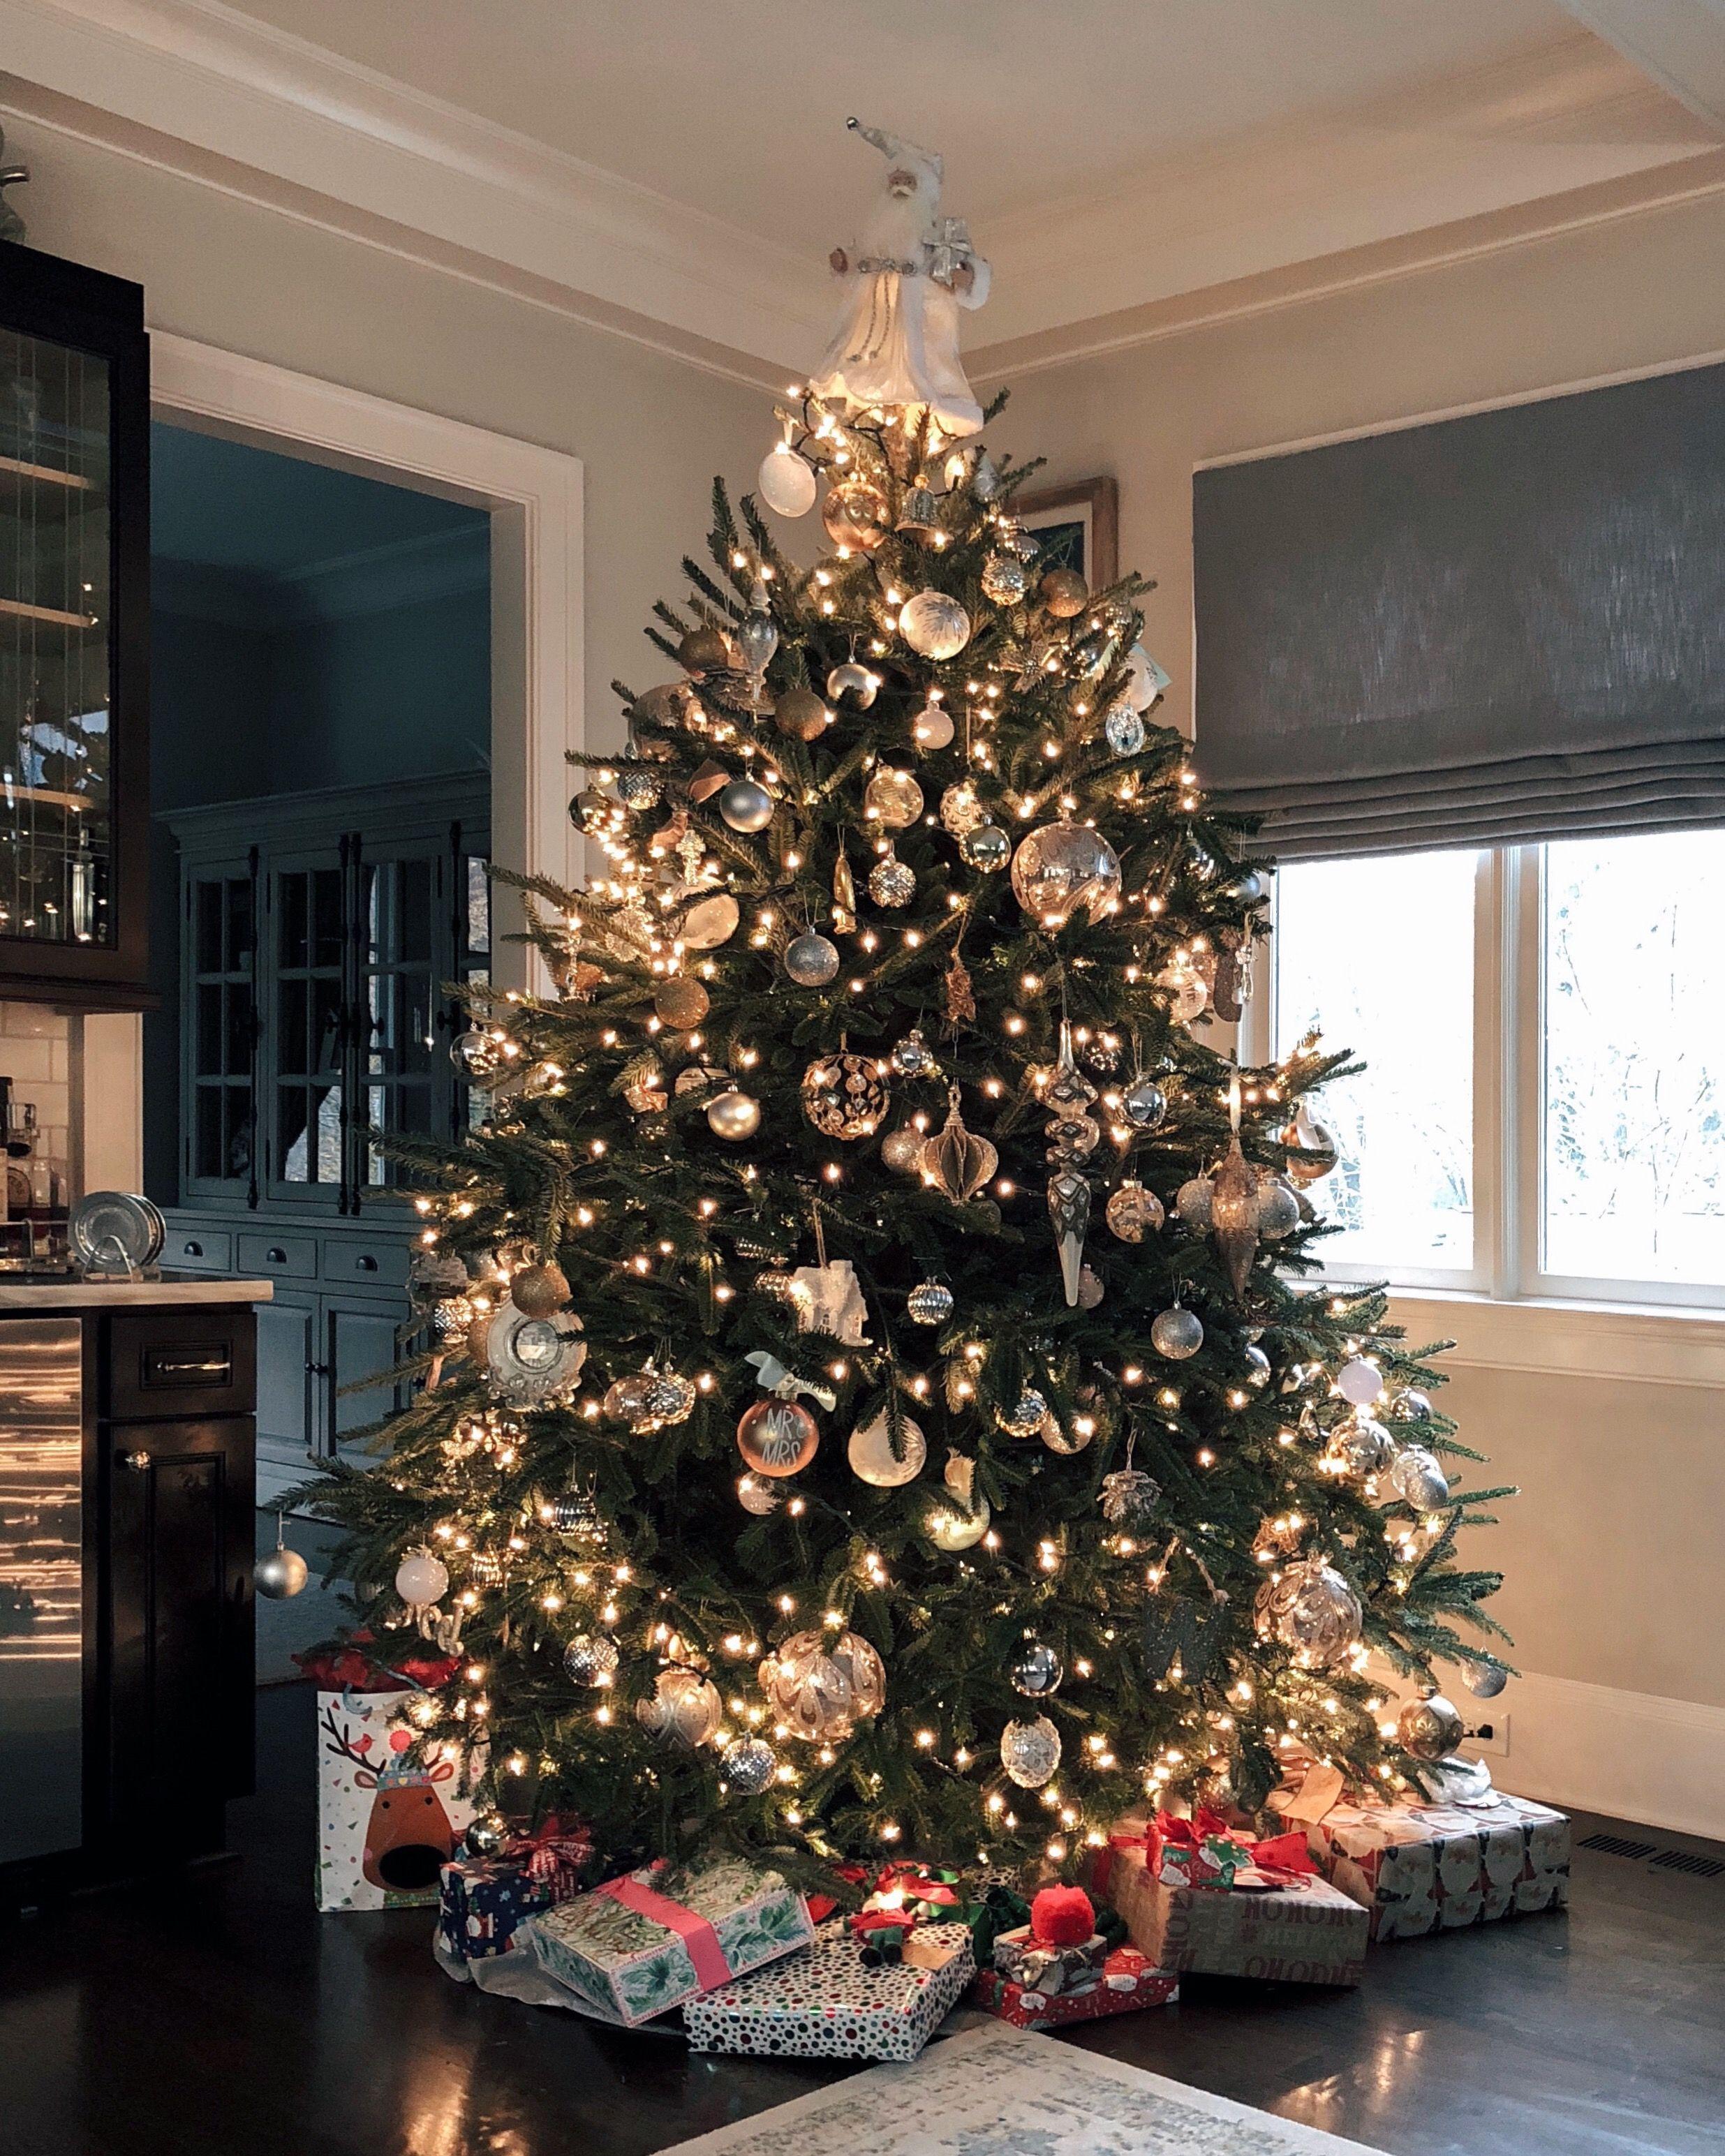 Christmas Tree Inspo Christmas Tree Inspo Shabby Chic Christmas Christmas Tree